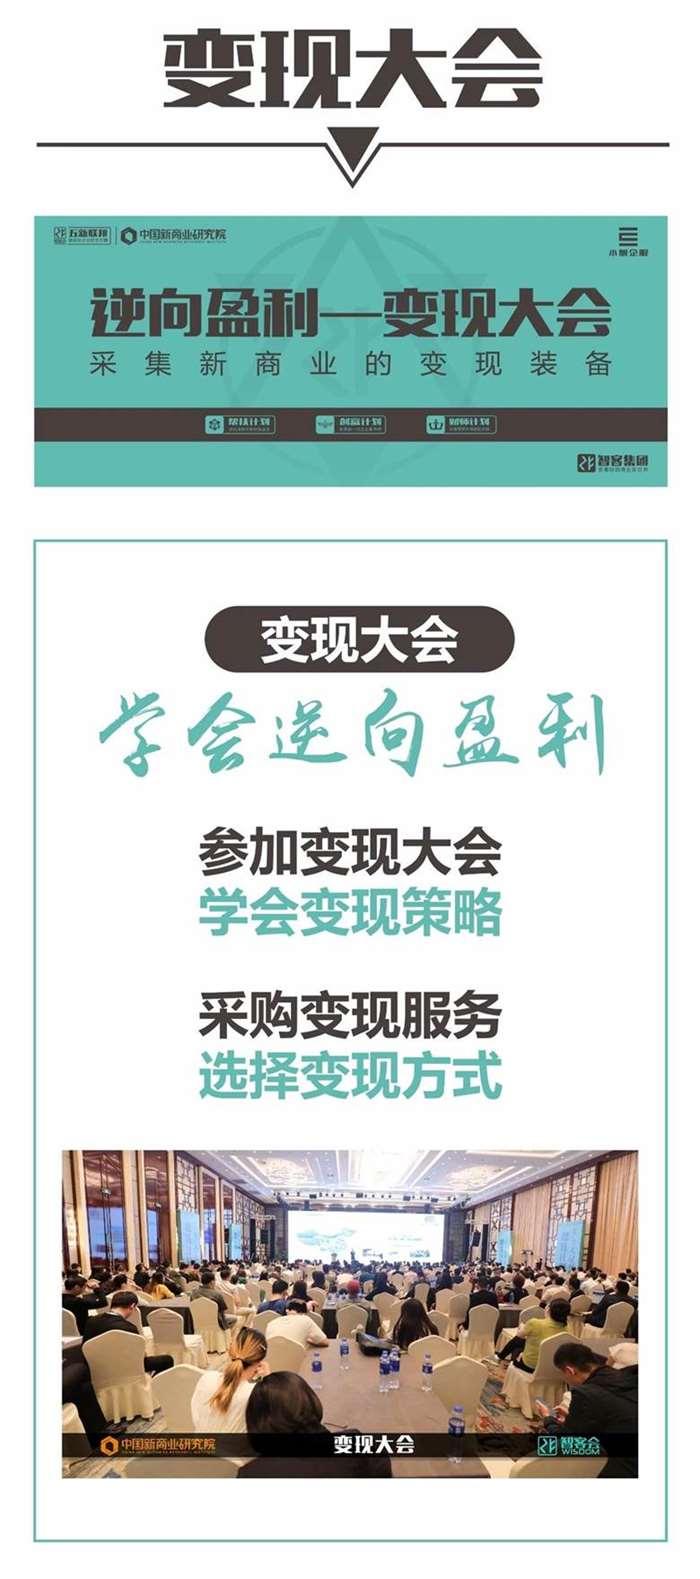 http://www.huodongxing.com/file/20191113/1063603644976/213617916455879.jpg